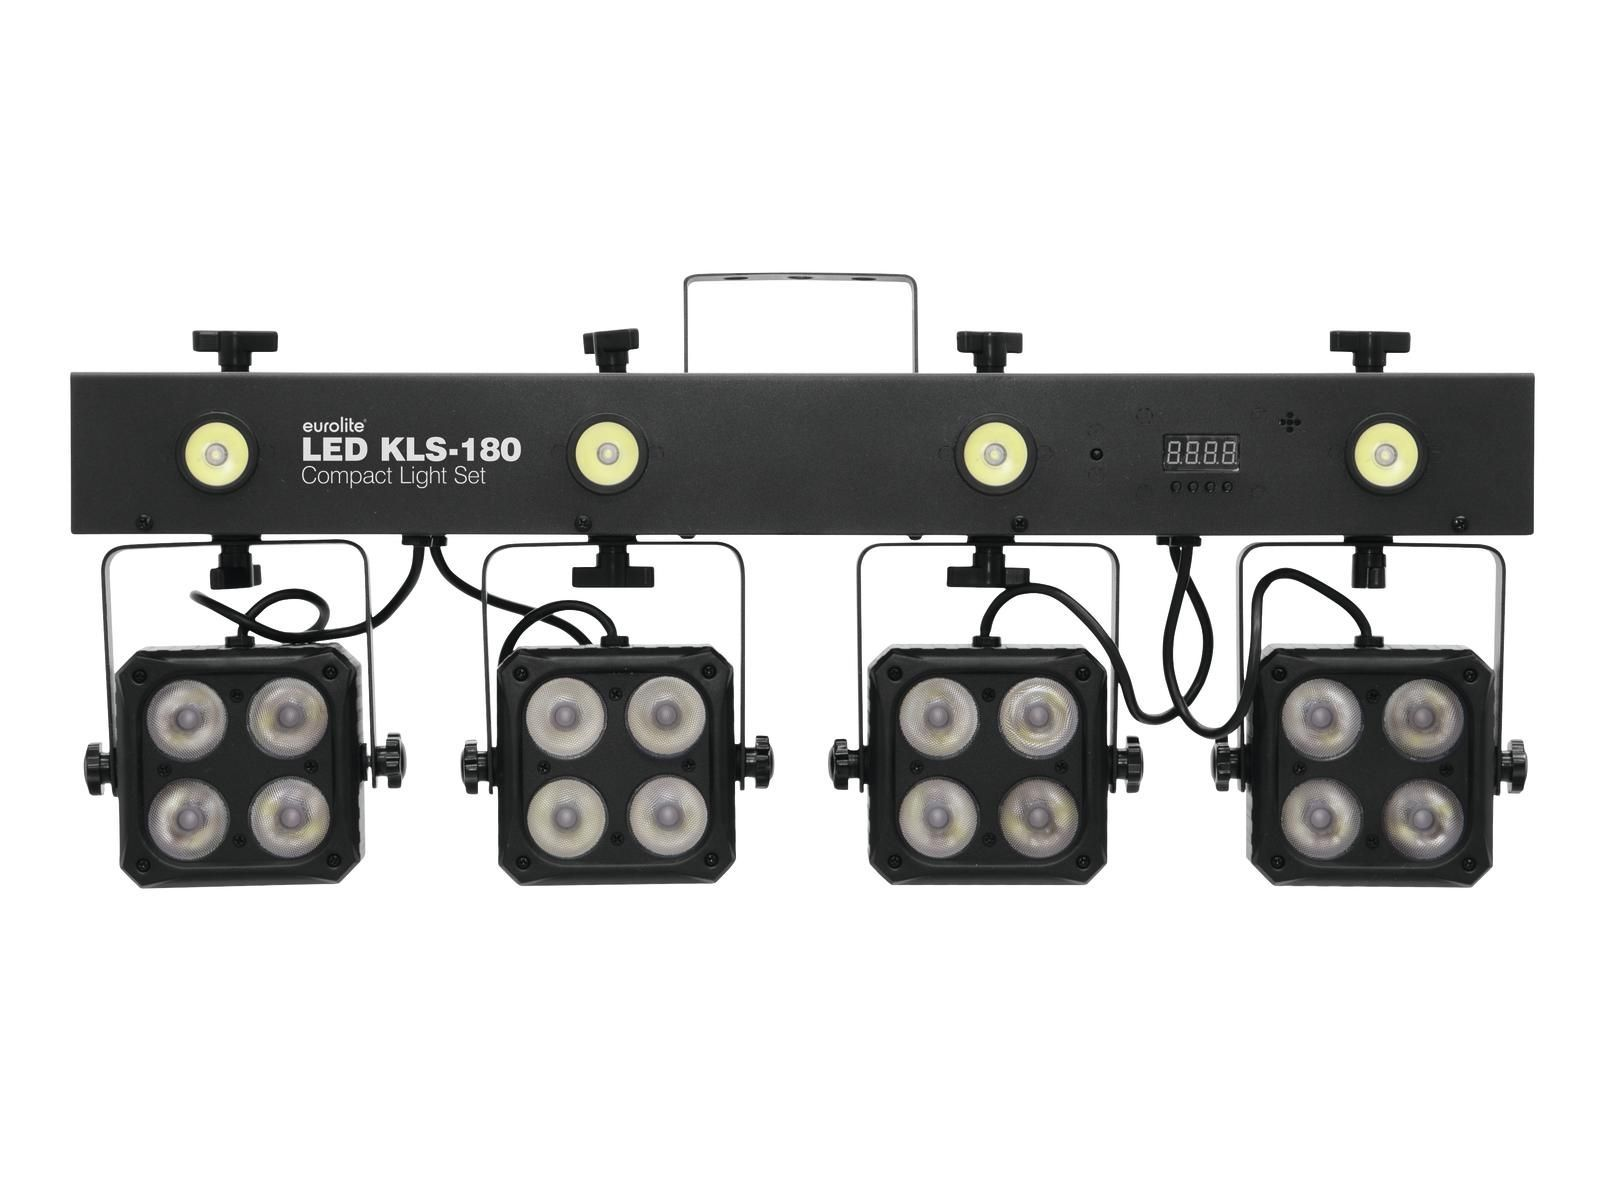 EUROLITE LED KLS 180 Kompakt-Lichtset, LED Lichtanlage